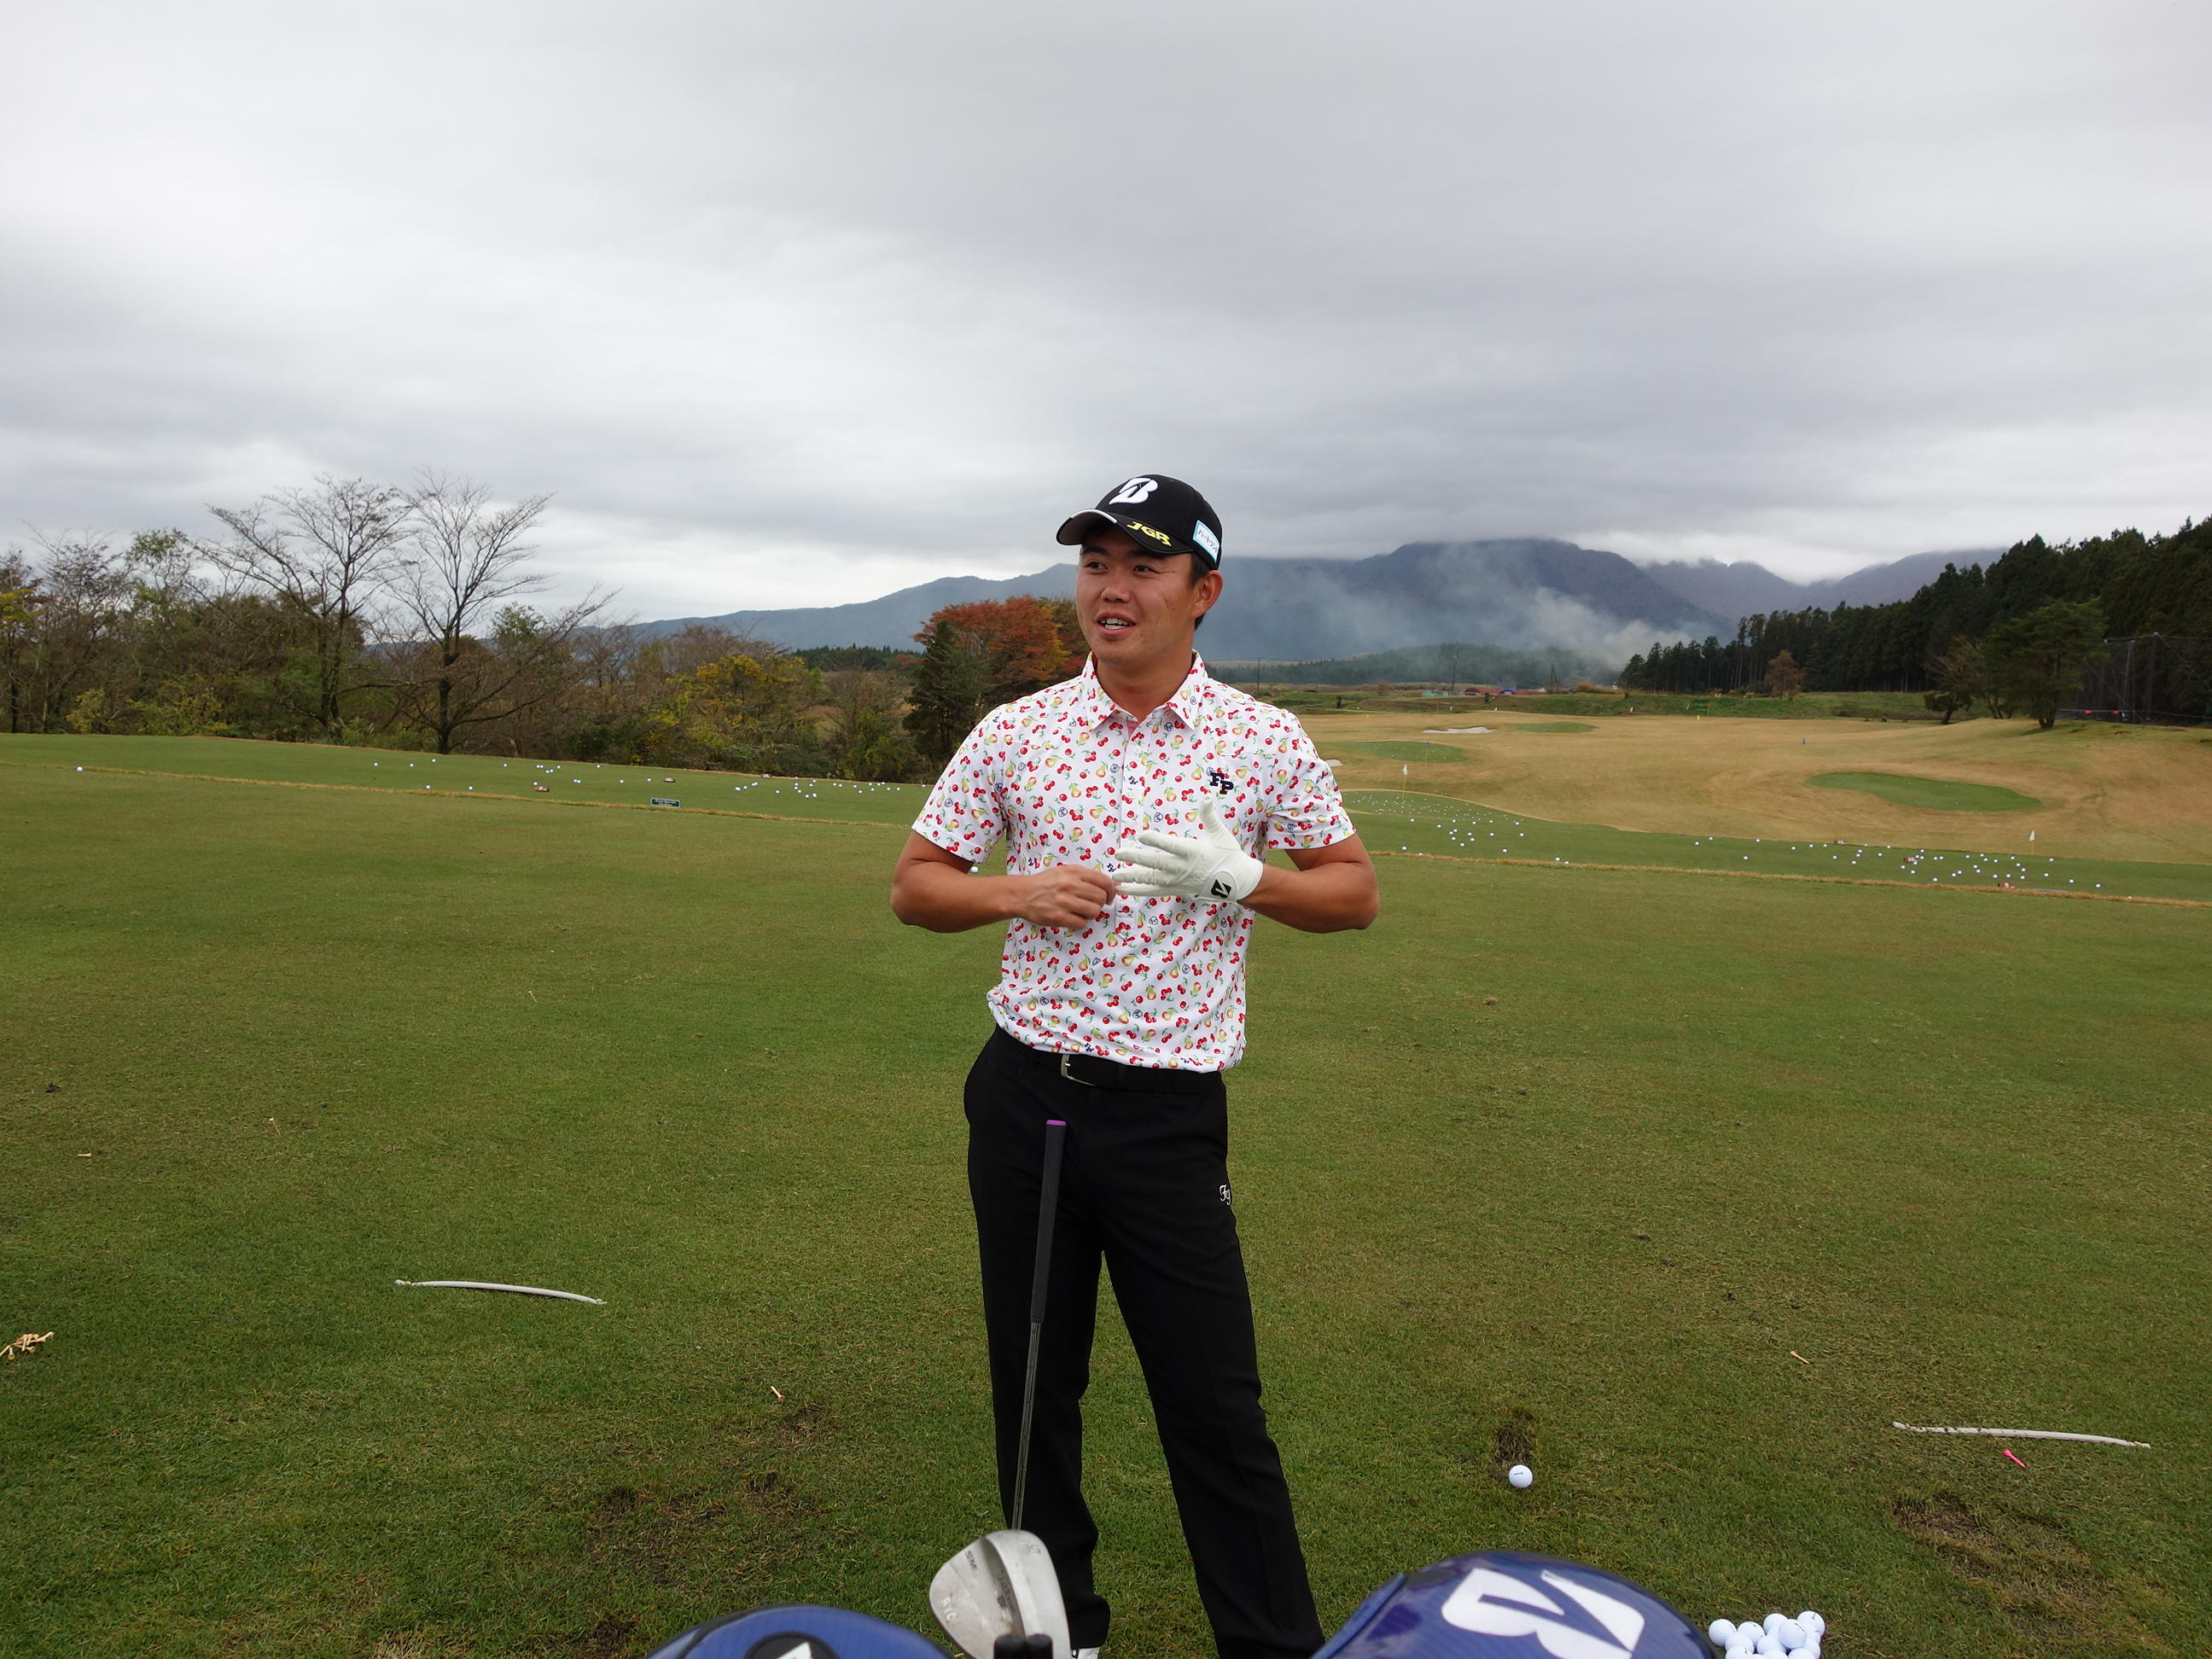 http://www.bs-golf.com/pro/8b3899e566b823c768987be947a99ad34b38c188.JPG